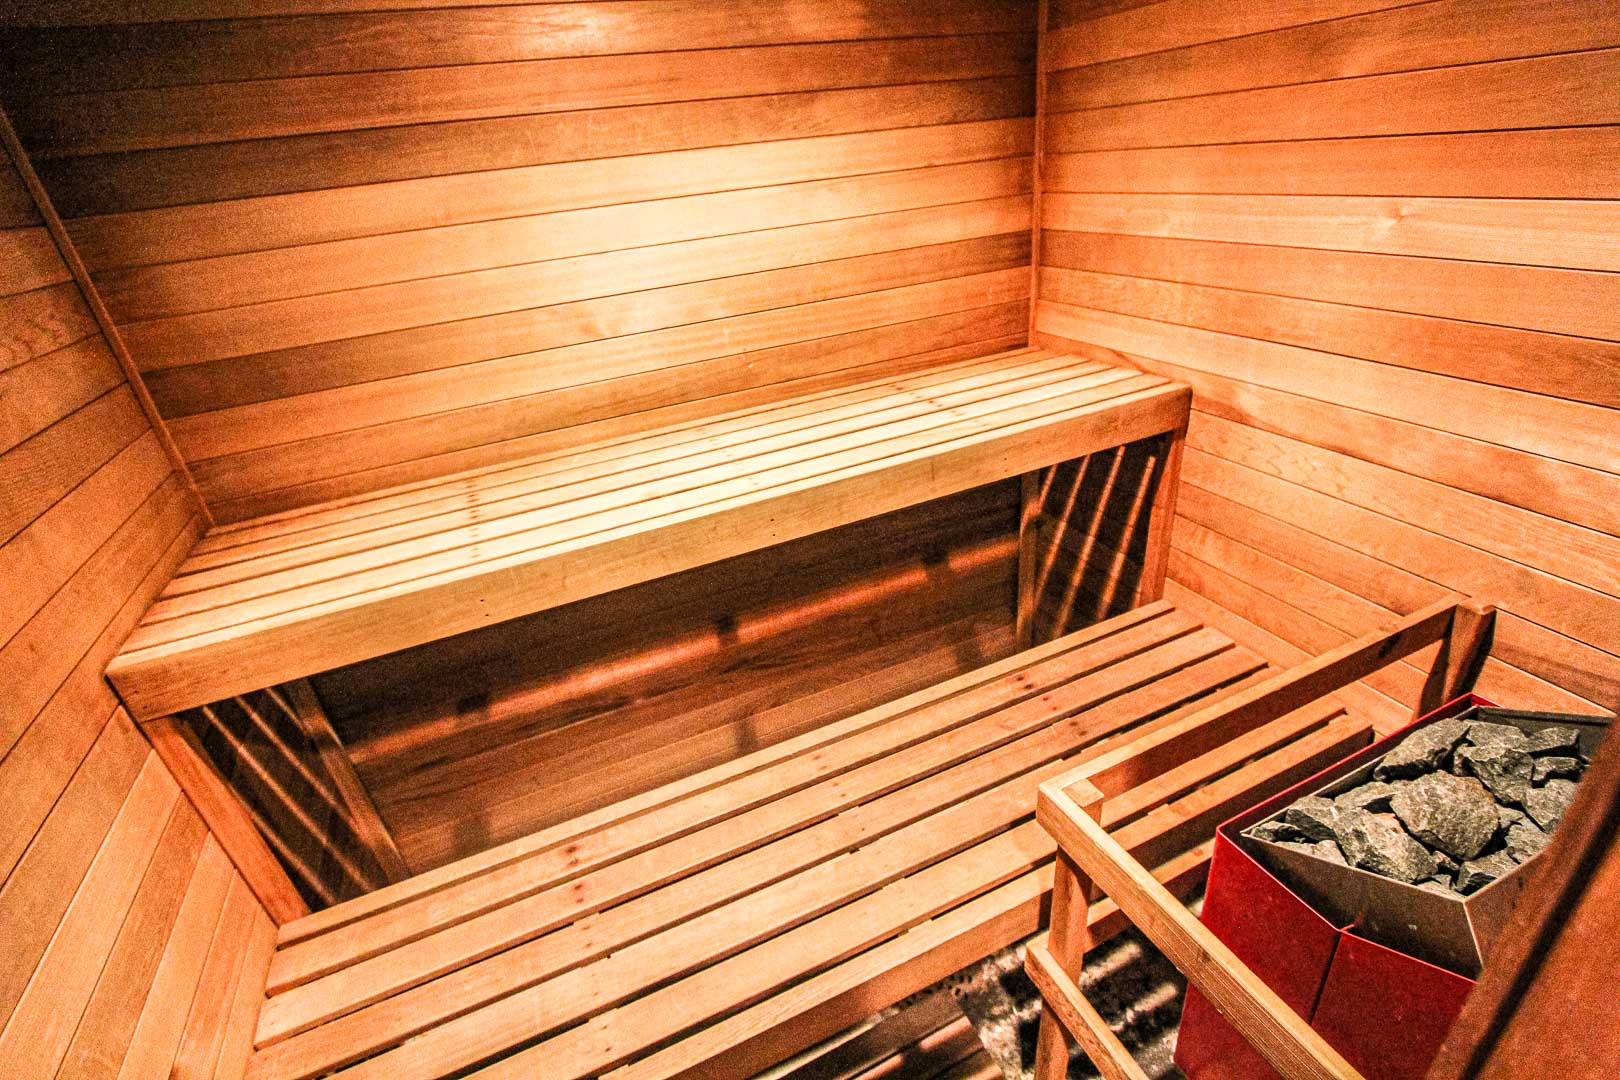 A relaxing sauna room at VRI's Sunburst Resort in Steamboat Springs, Colorado.